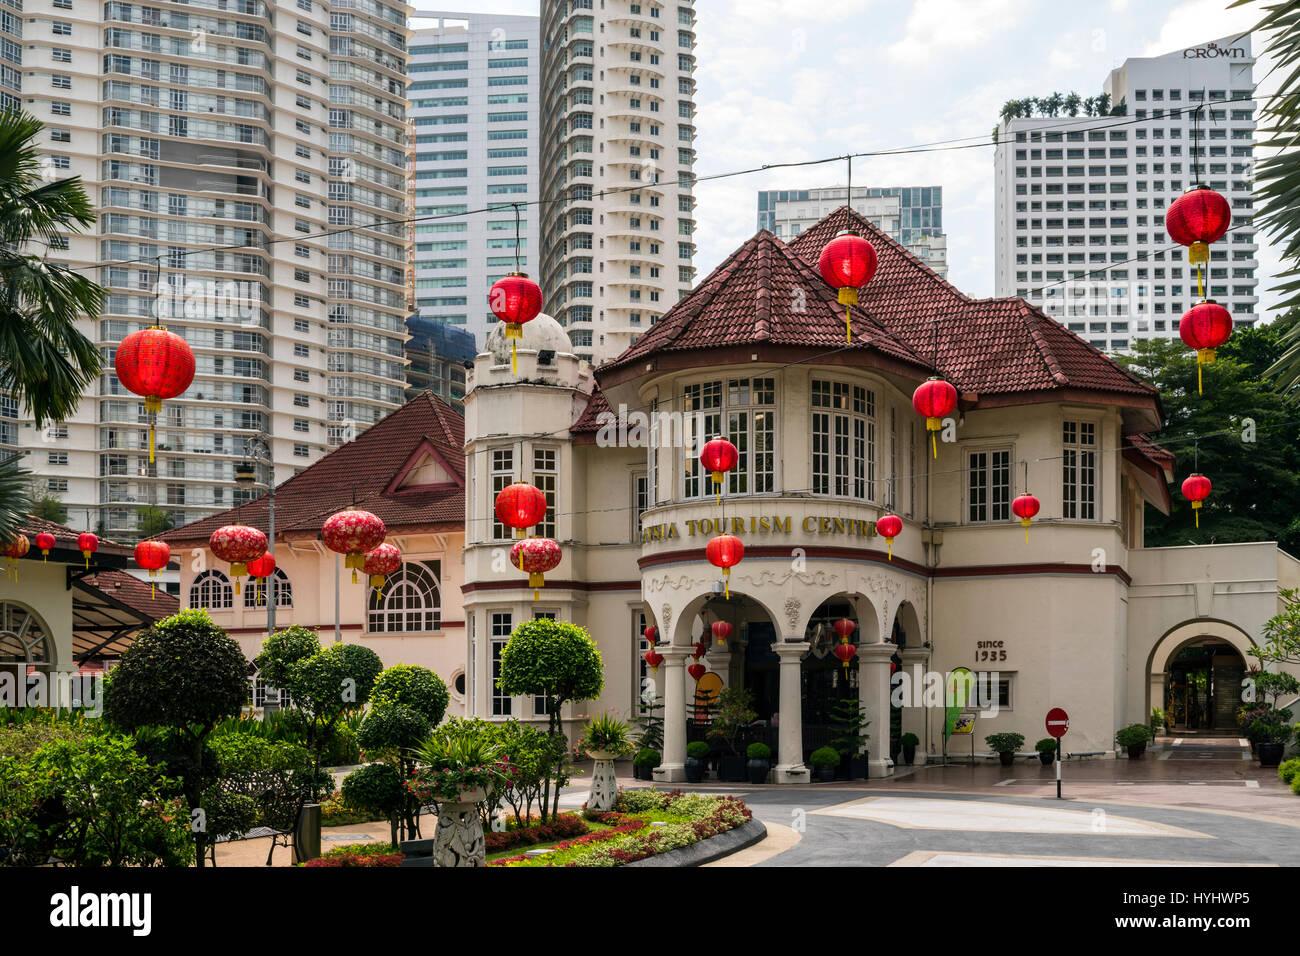 Centro de Turismo de Malasia, Kuala Lumpur, Malasia Imagen De Stock